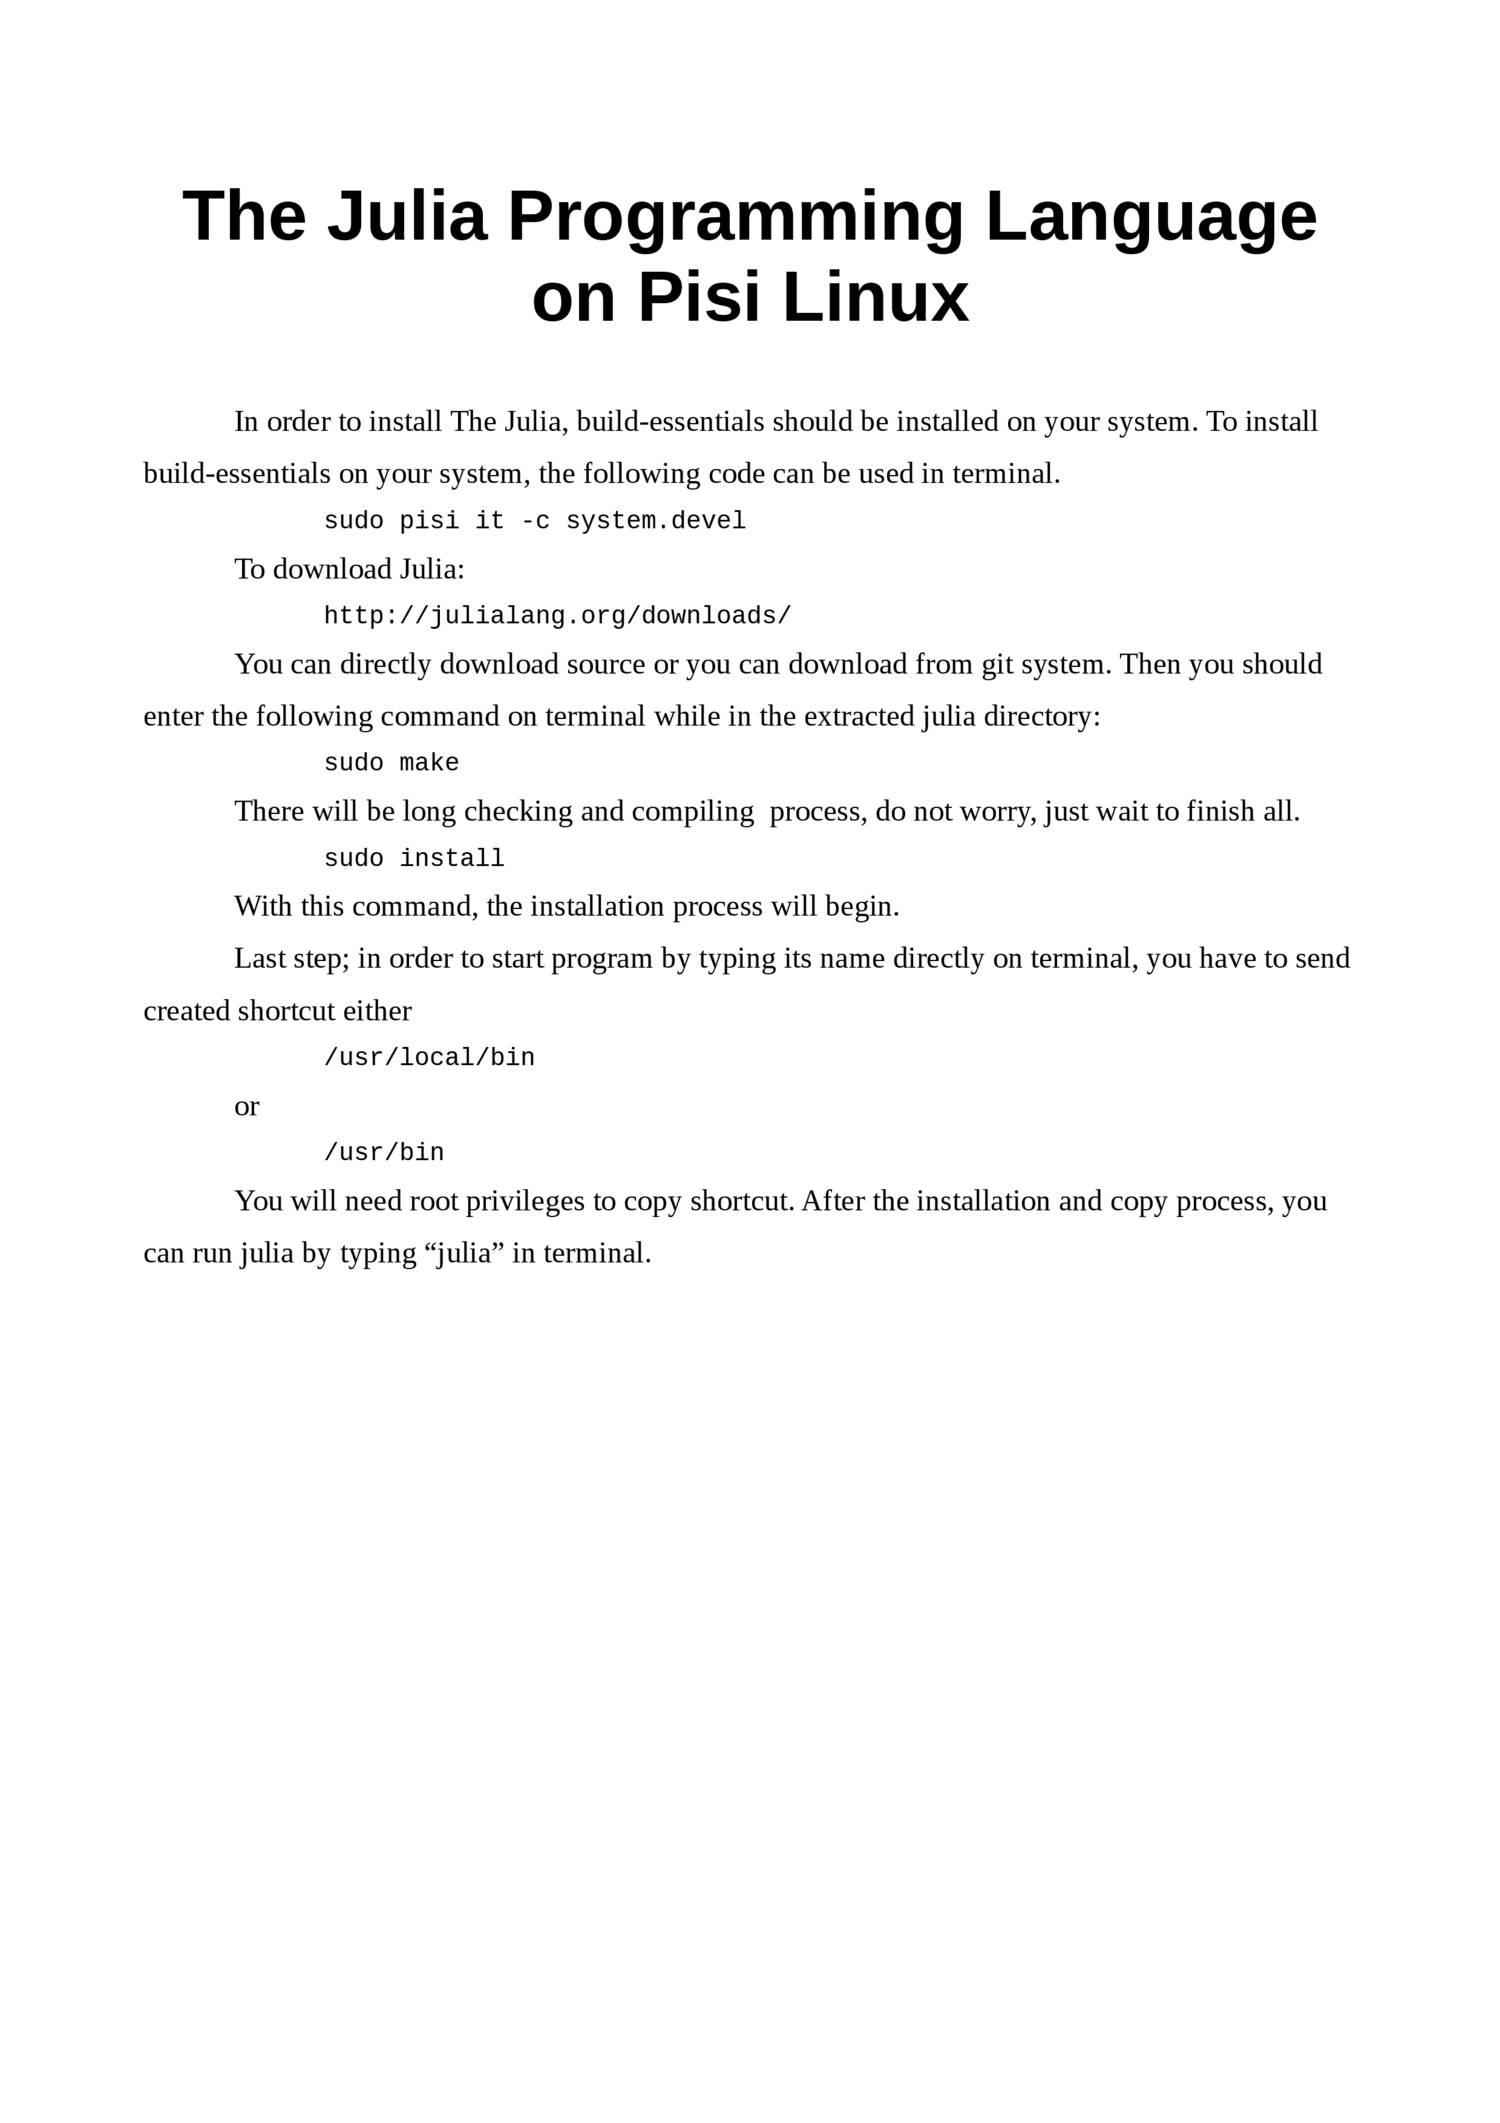 The julia programming language on pisi linux pdf | DocDroid